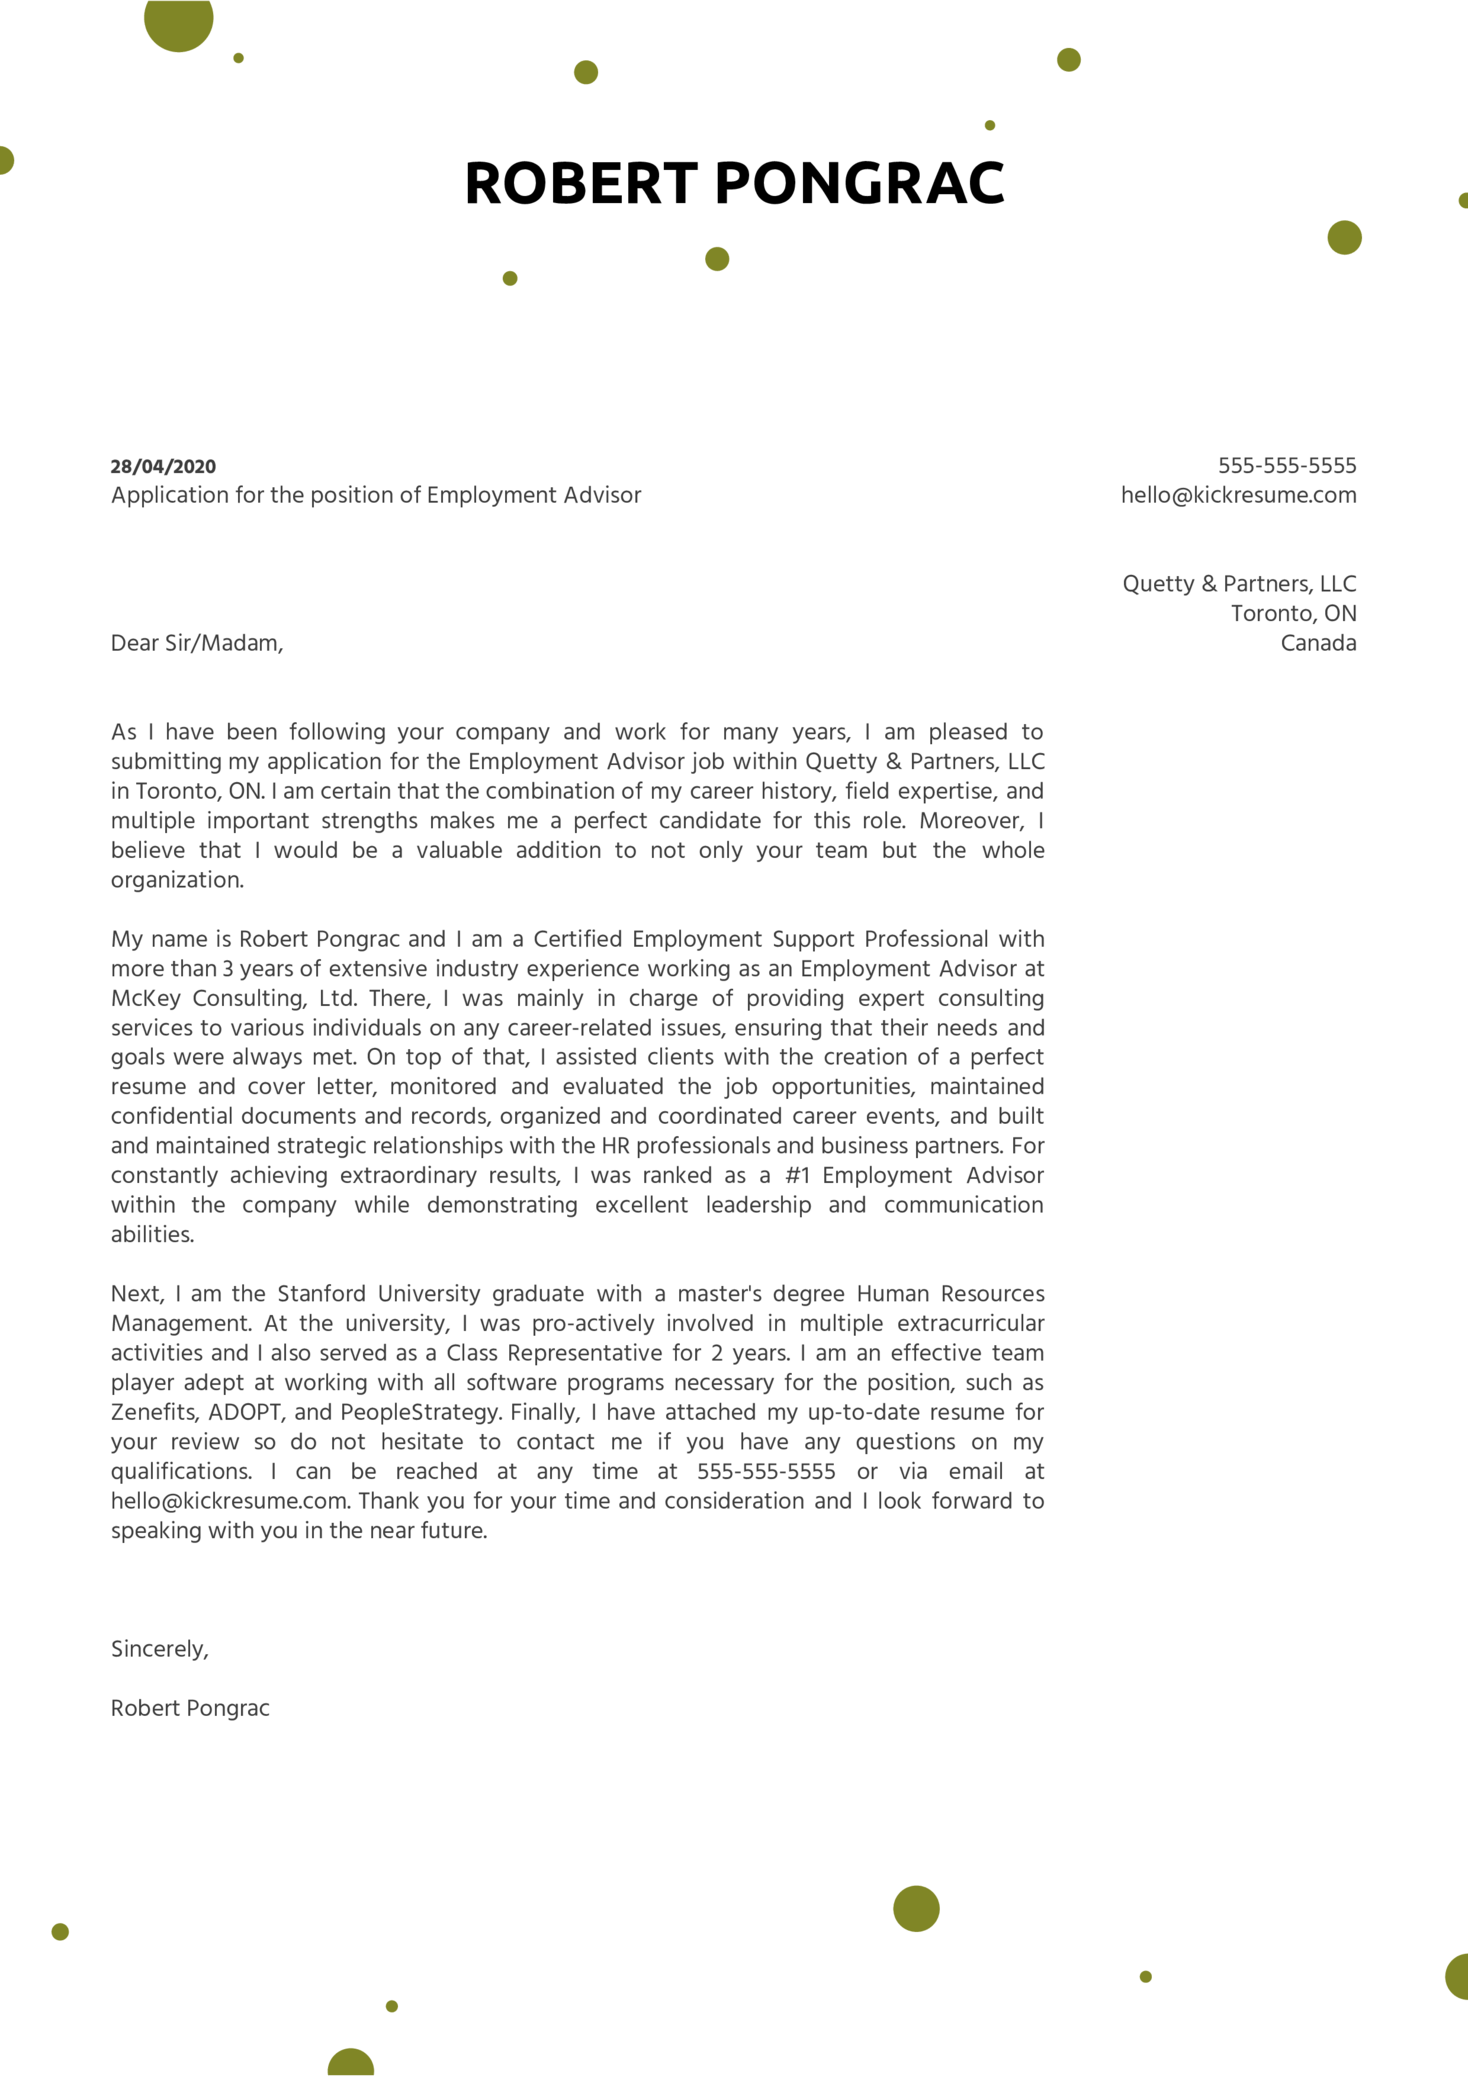 Employment Advisor Cover Letter Example